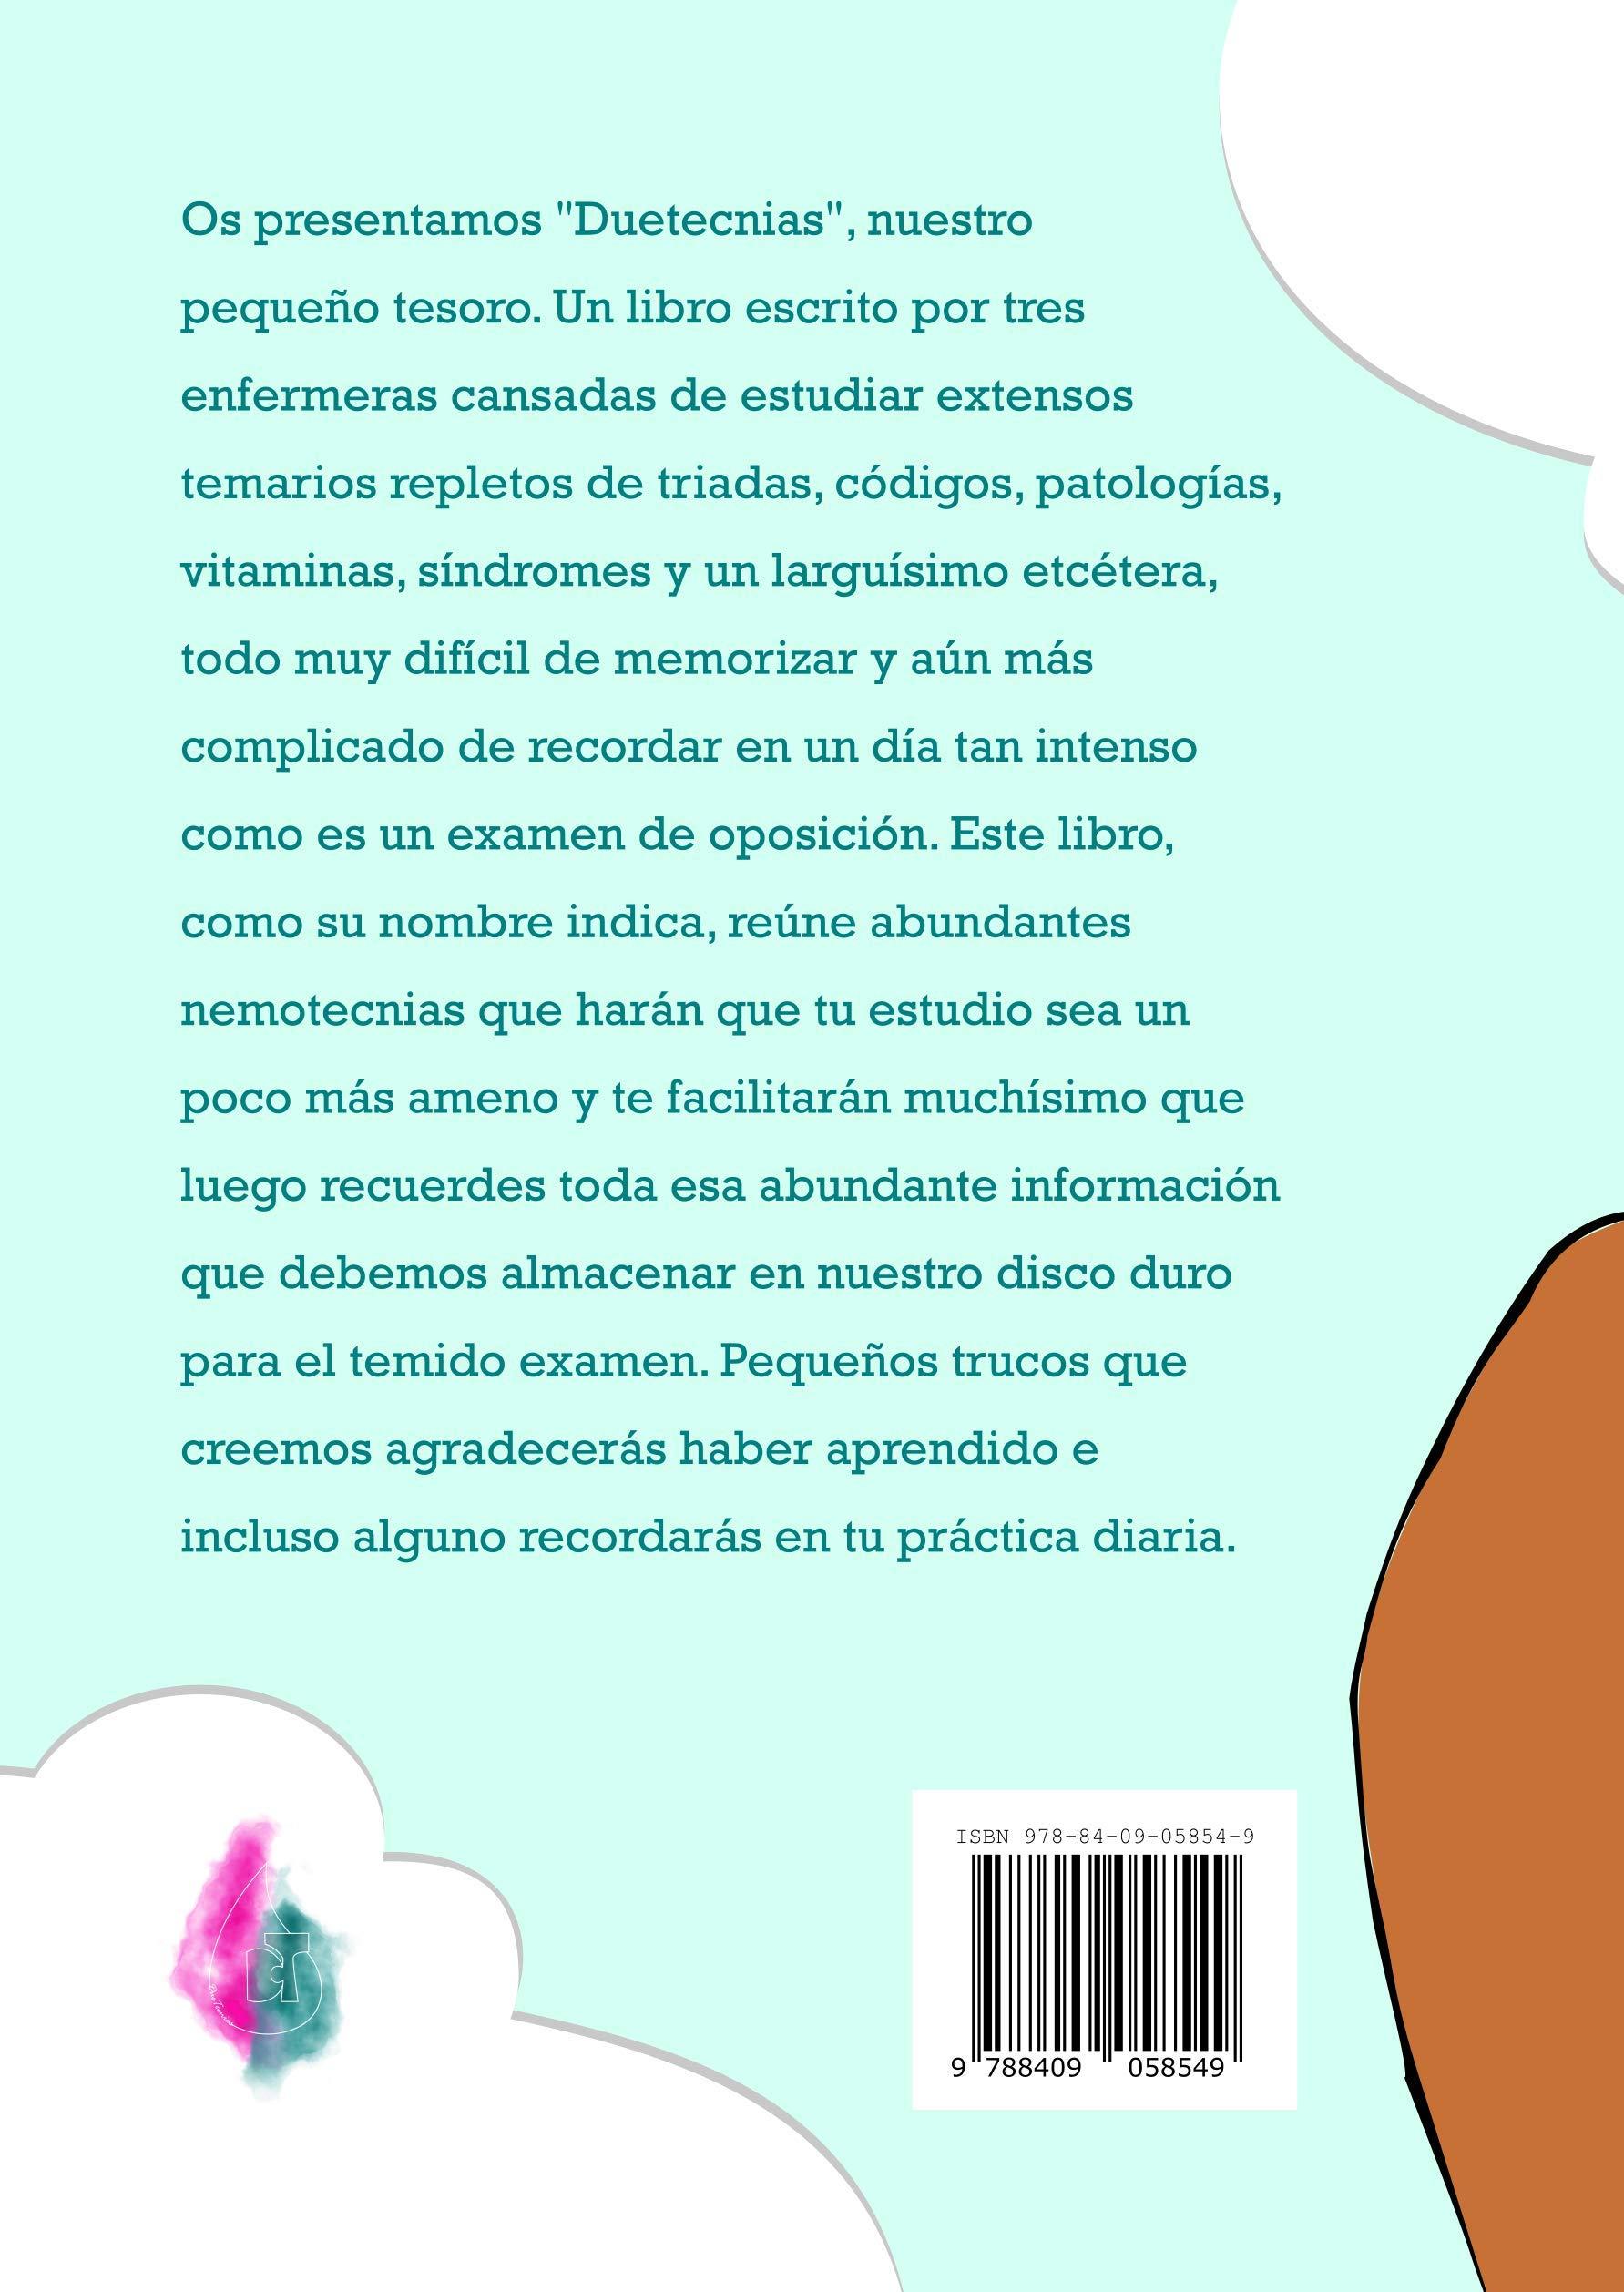 Duetecnias (nemotecnias para enfermeria): Amazon.es: Ines Fernandez Moreno, Garazi Rodrigo Sanchez, Monica Vicente Alfonso: Libros